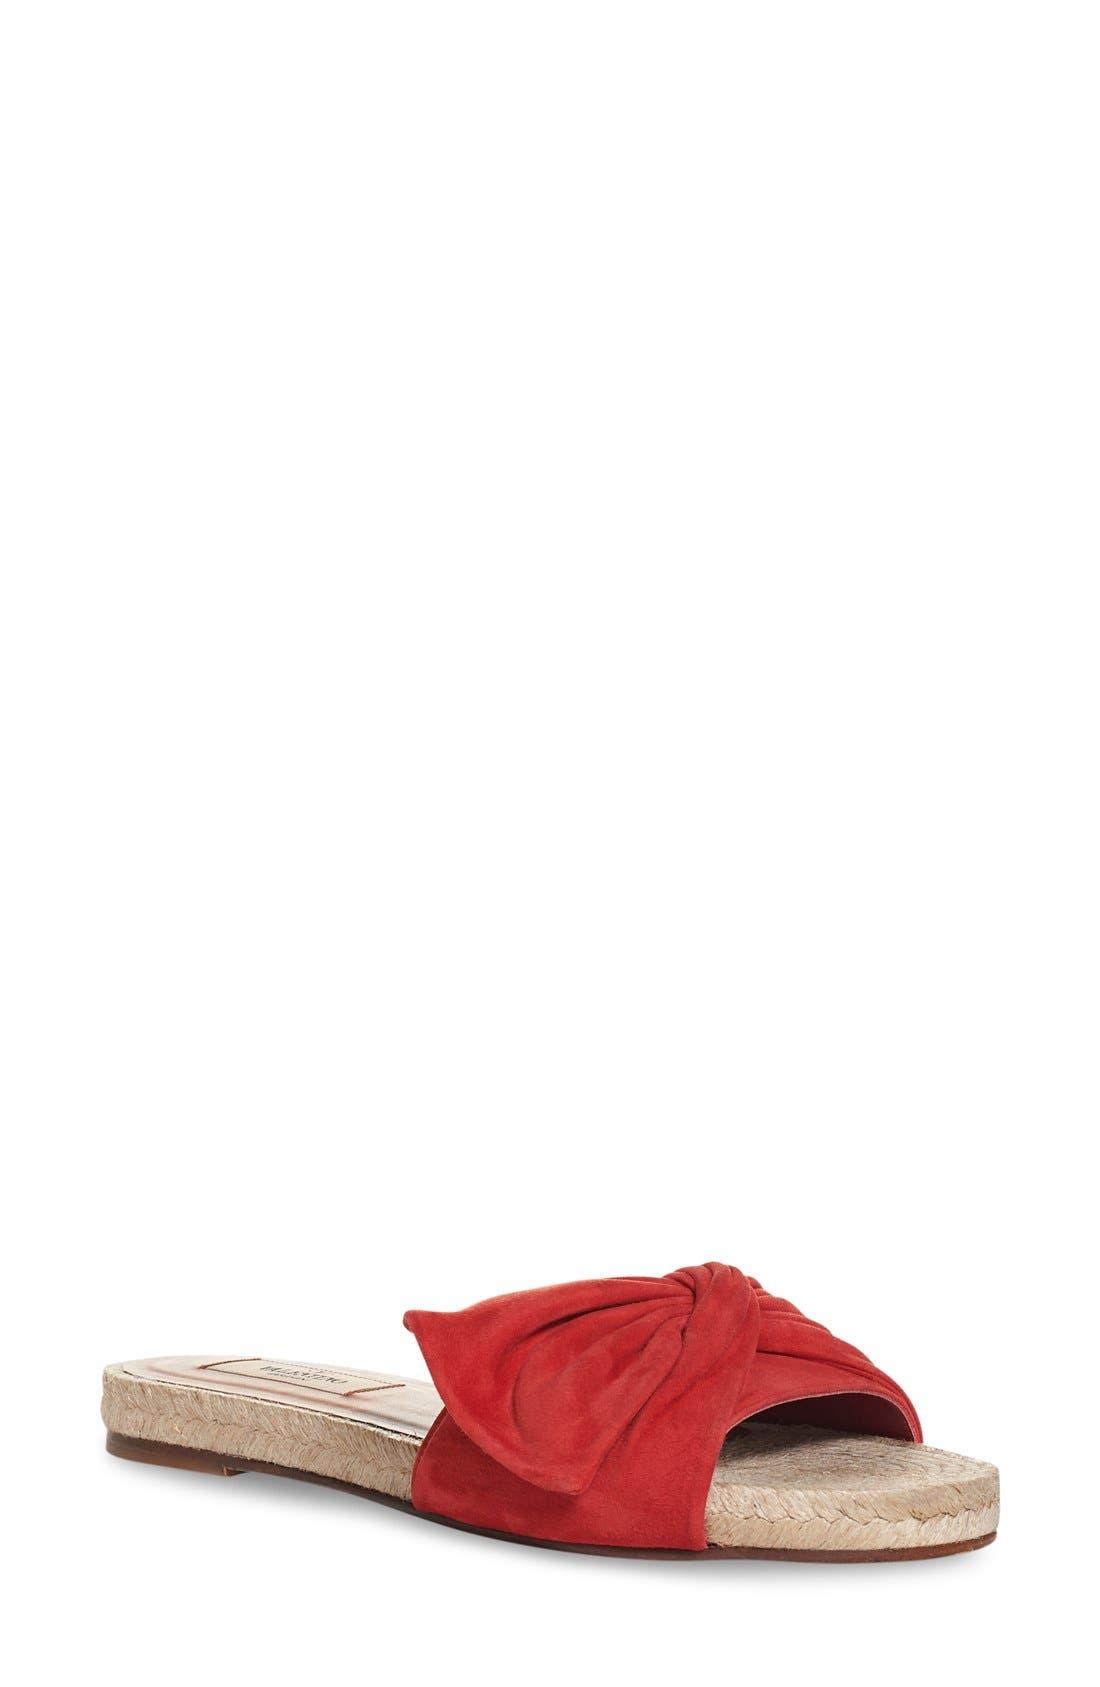 VALENTINO 'Bow' Espadrille Sandal